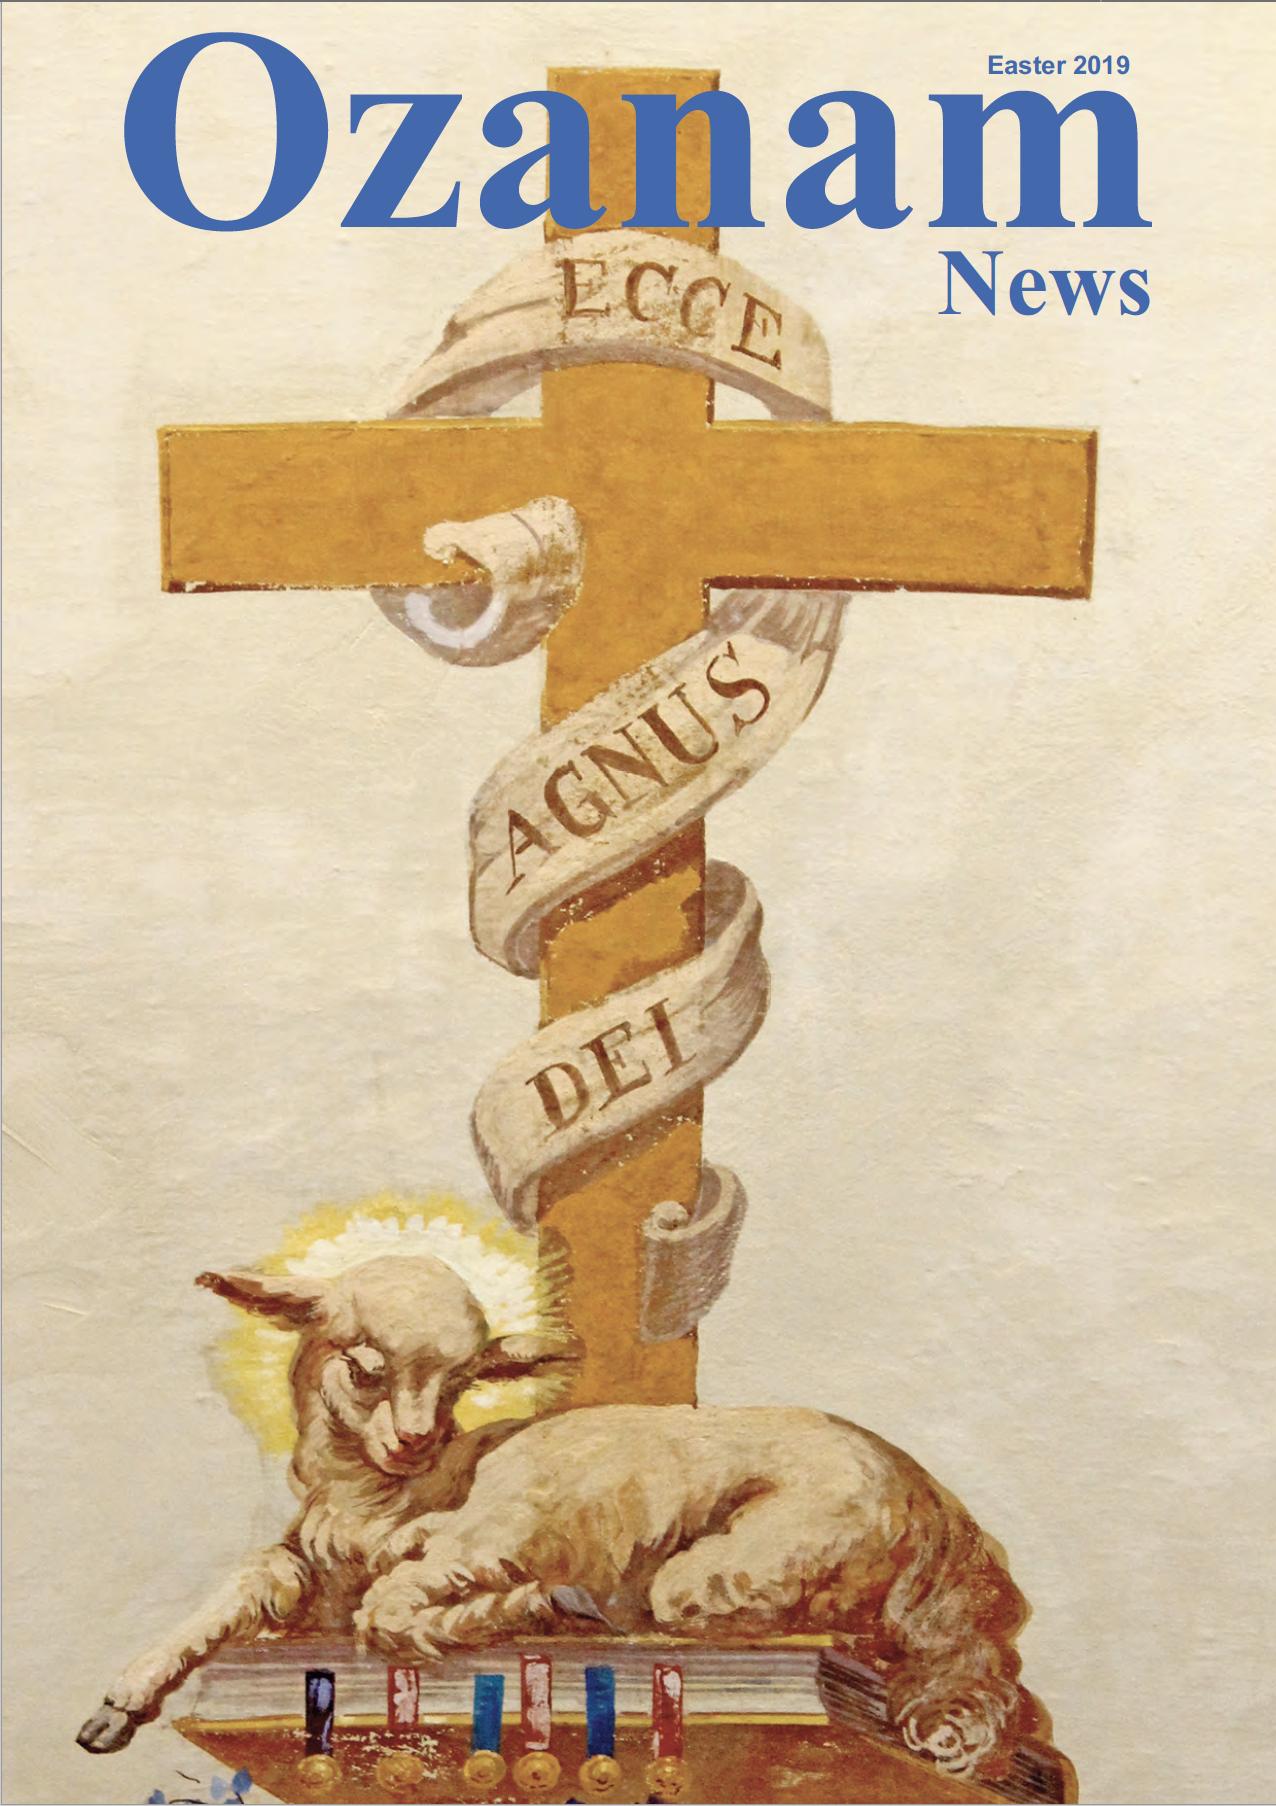 Ozanam News Easter 9